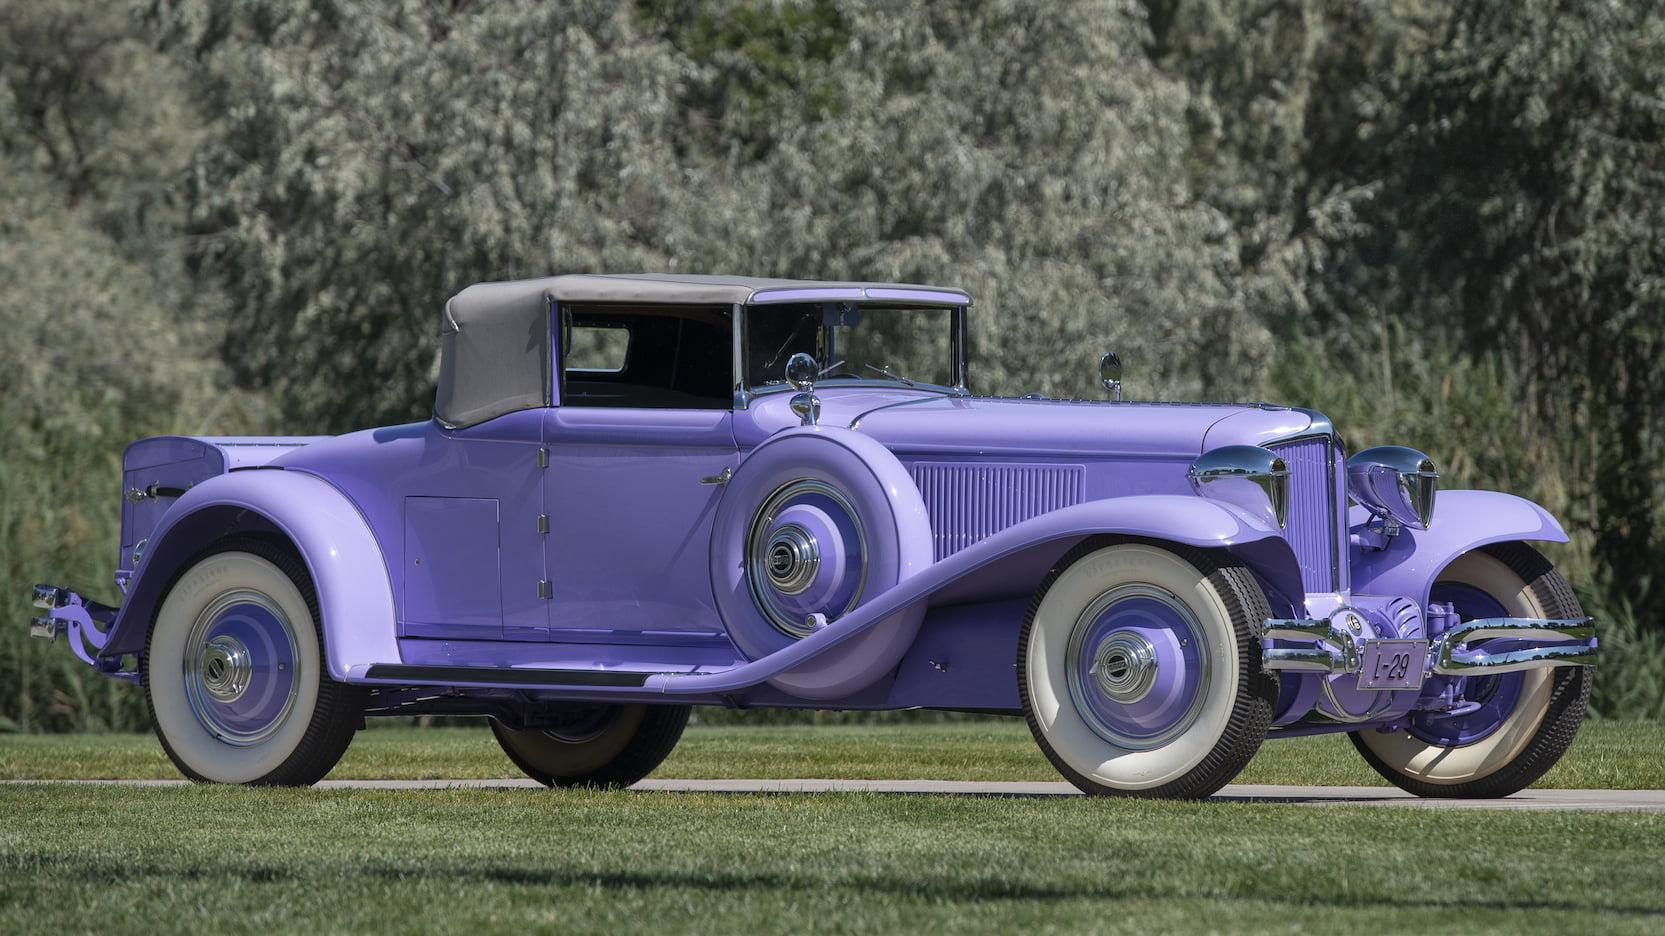 1930 Cord L-29 Cabriolet purple